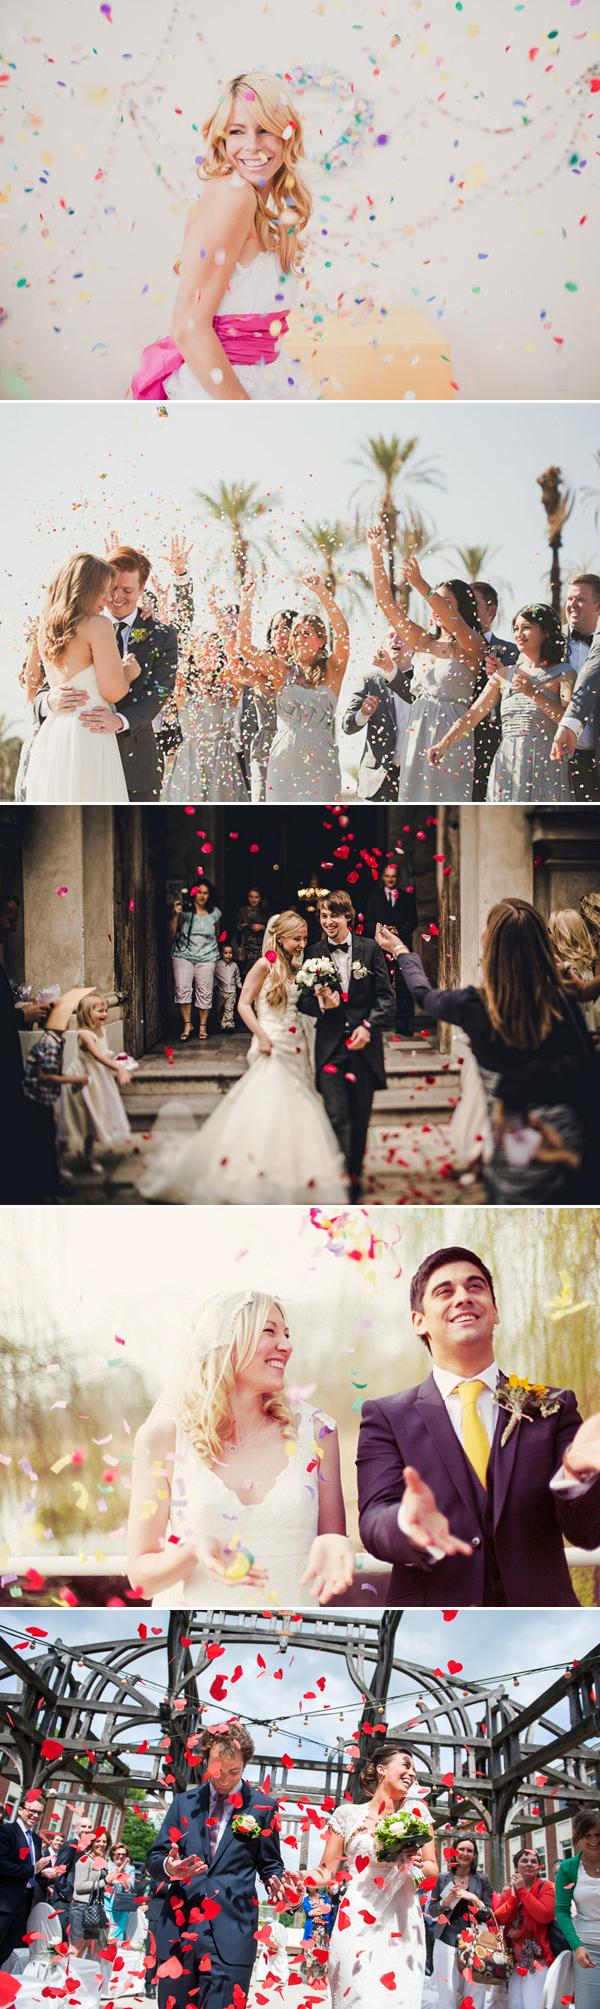 wedding-exit04-confetti